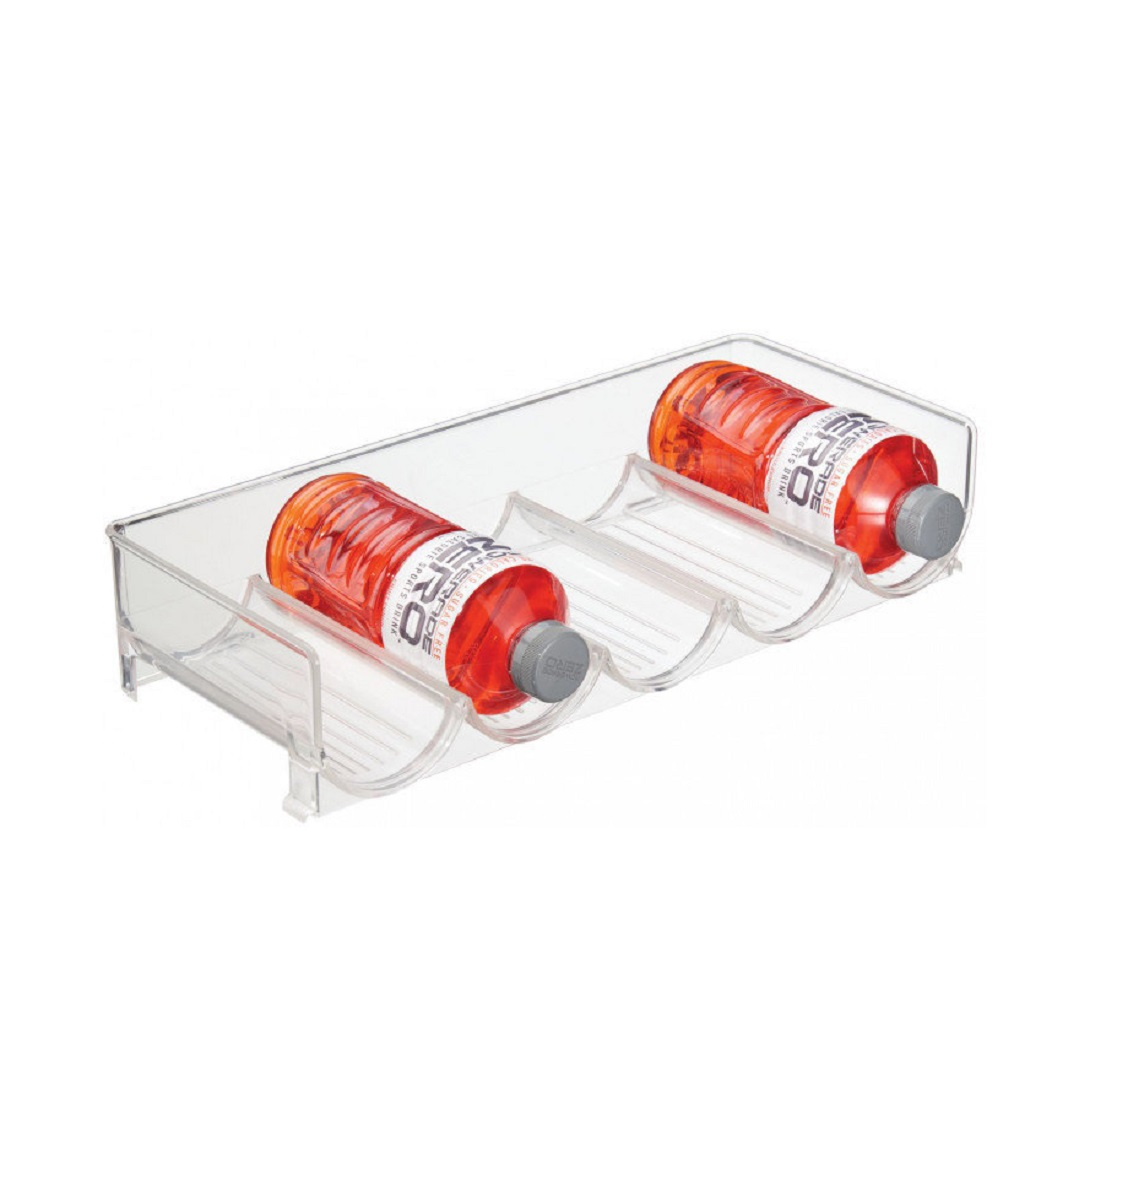 Онлайн каталог PROMENU: Контейнер для хранения бутылок iDesign LINUS, 20,3х48,3х10,2 см, прозрачный                               71060EU